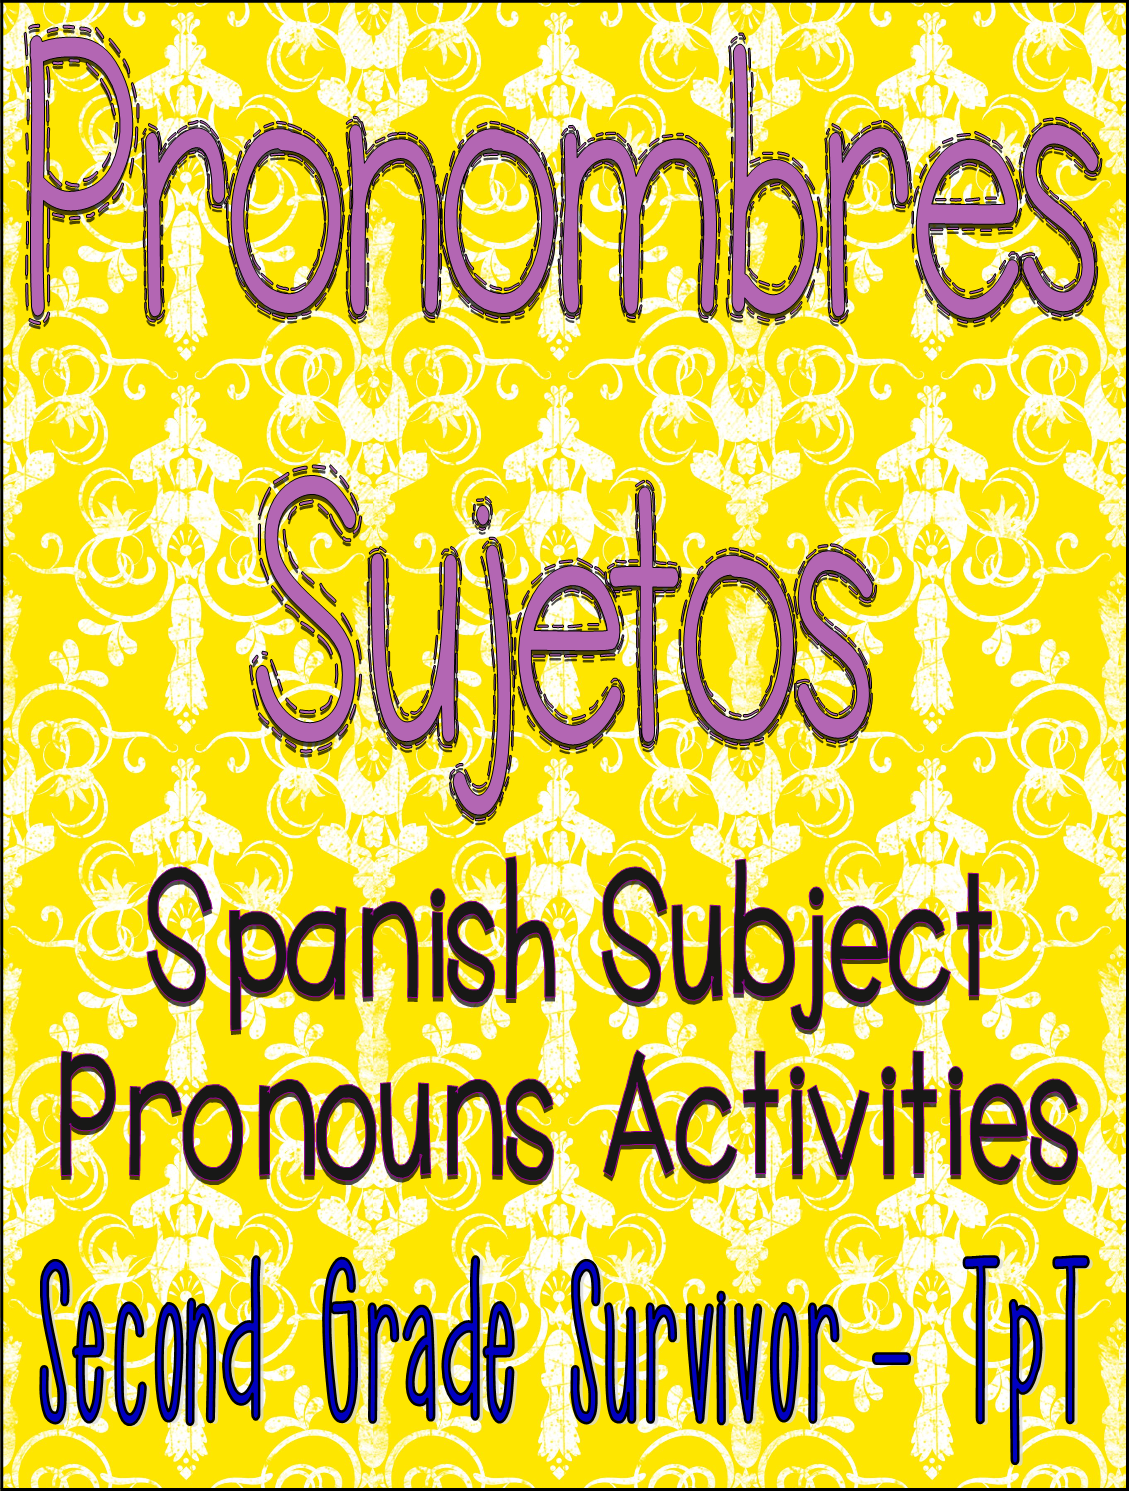 Spanish Subject Pronoun Activities